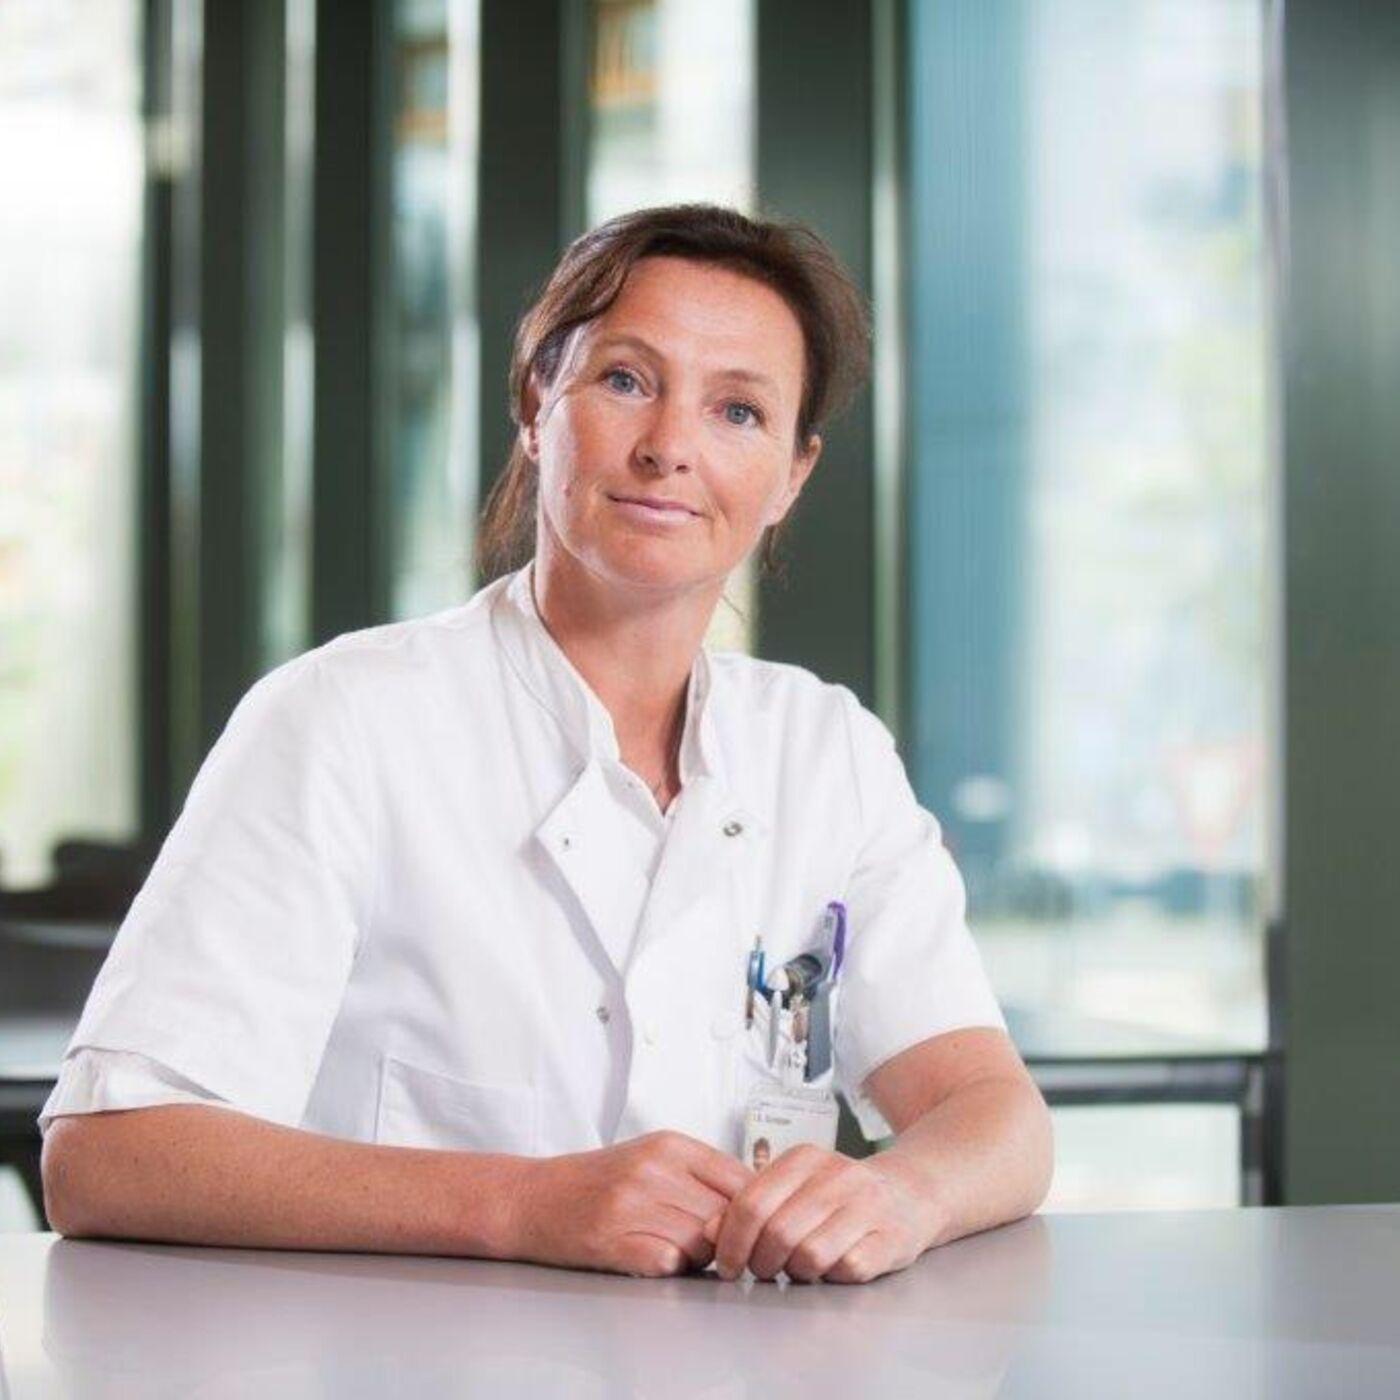 Prof. Dr. Inger Schipper